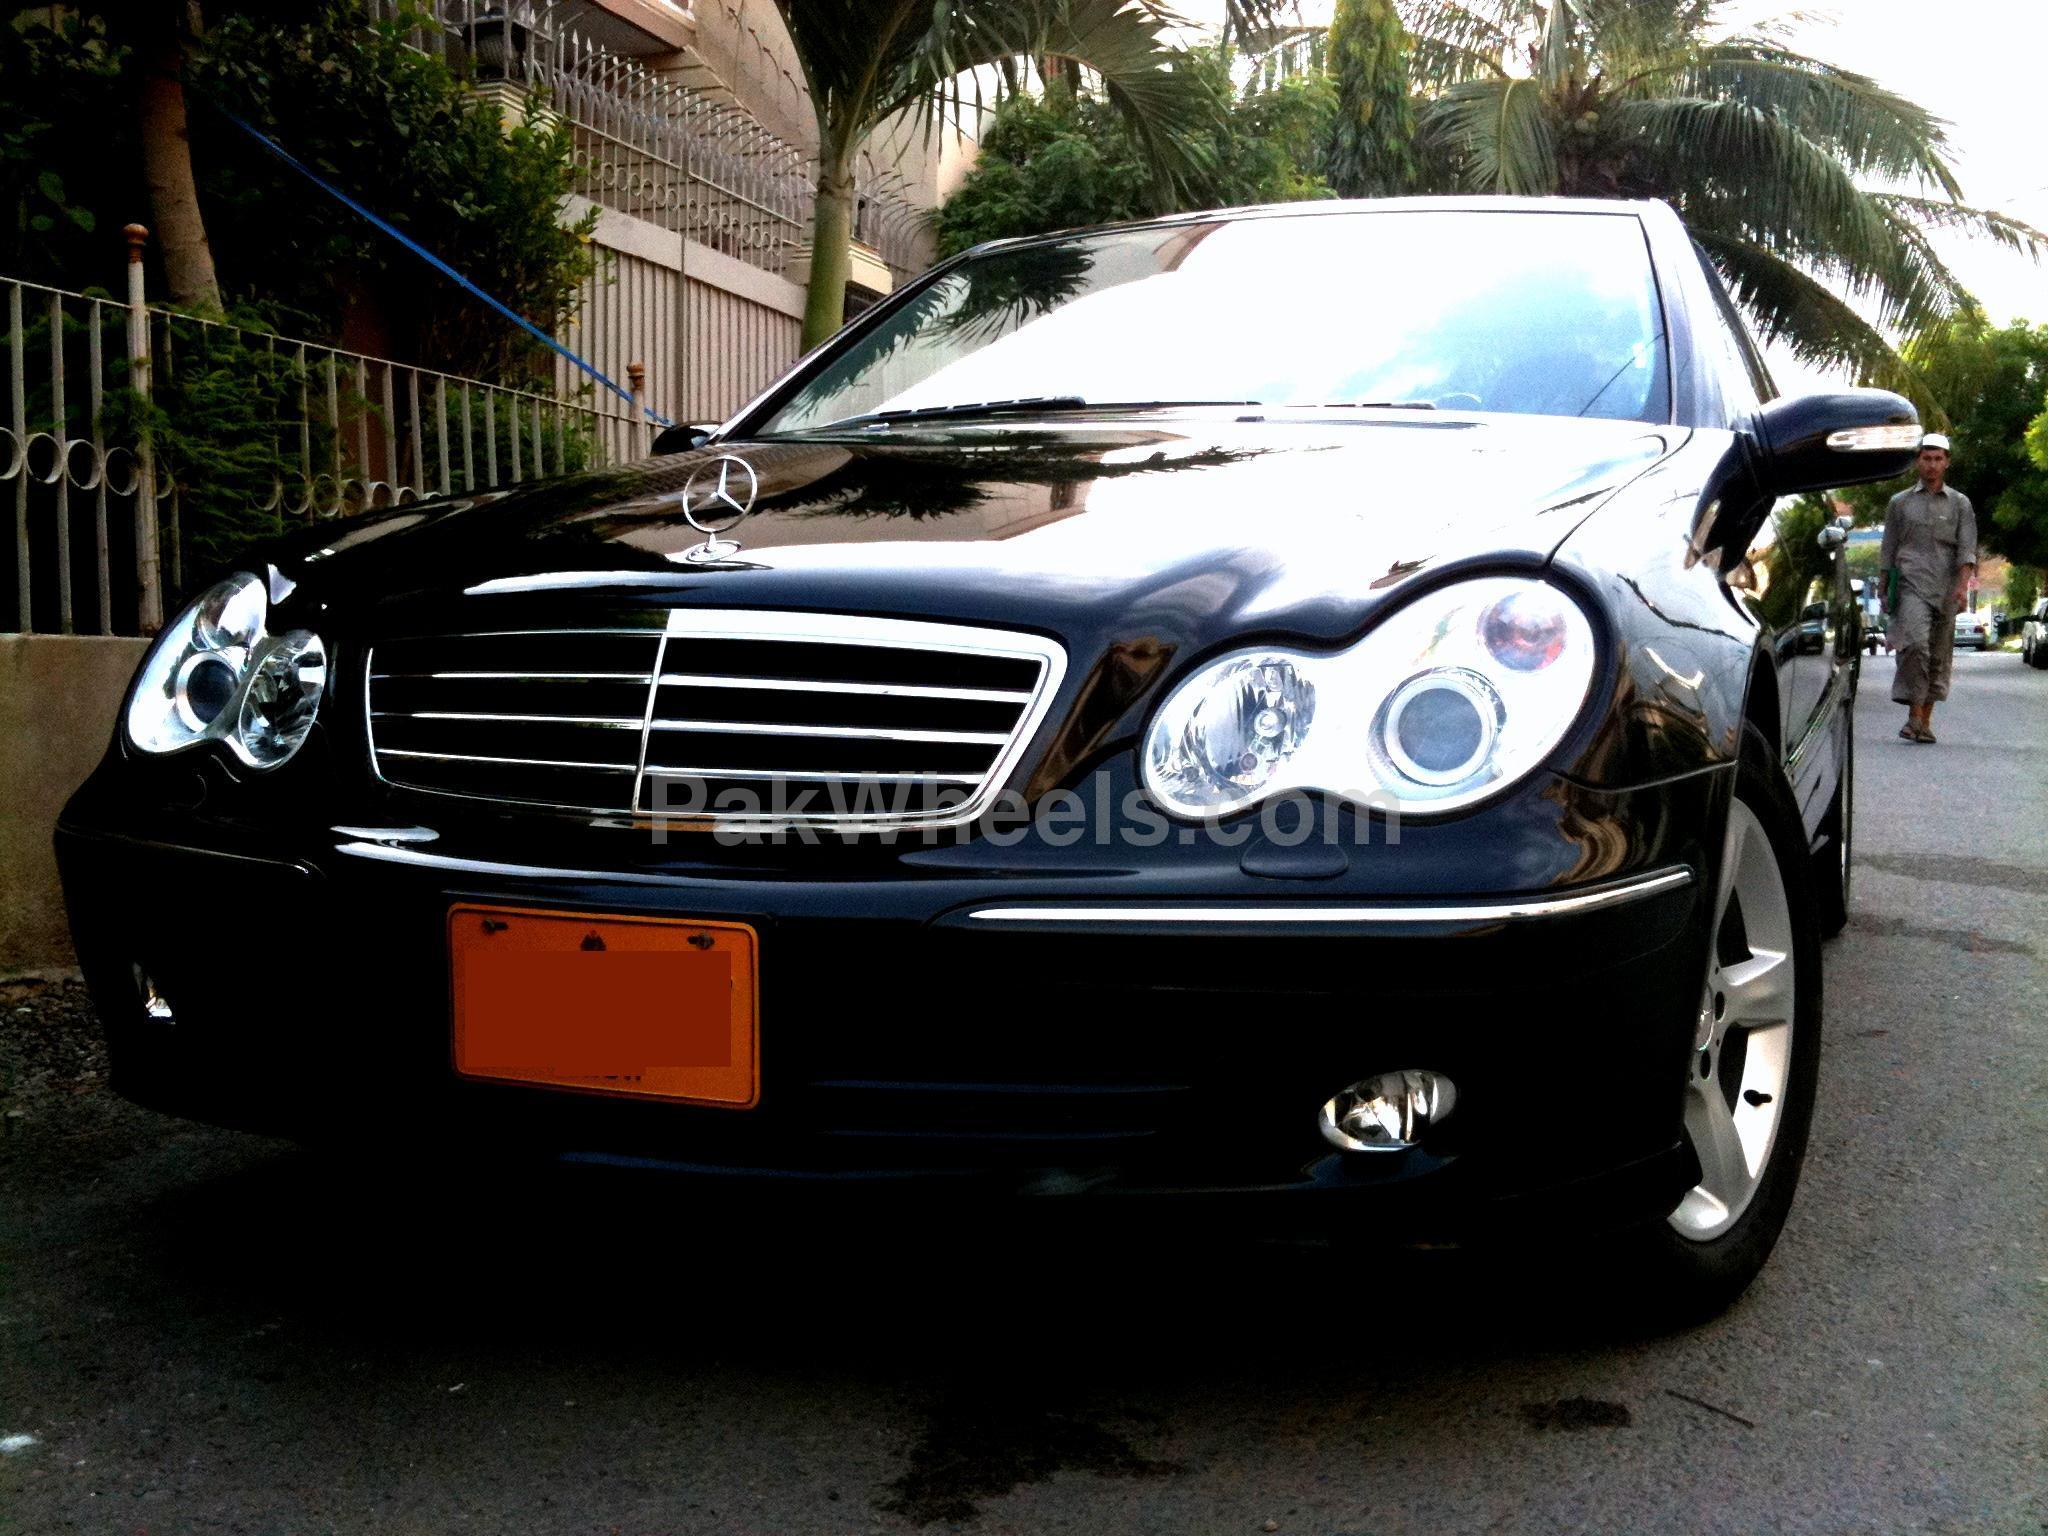 Mercedes Benz C Class - 2006 black beauti!! :)) Image-1